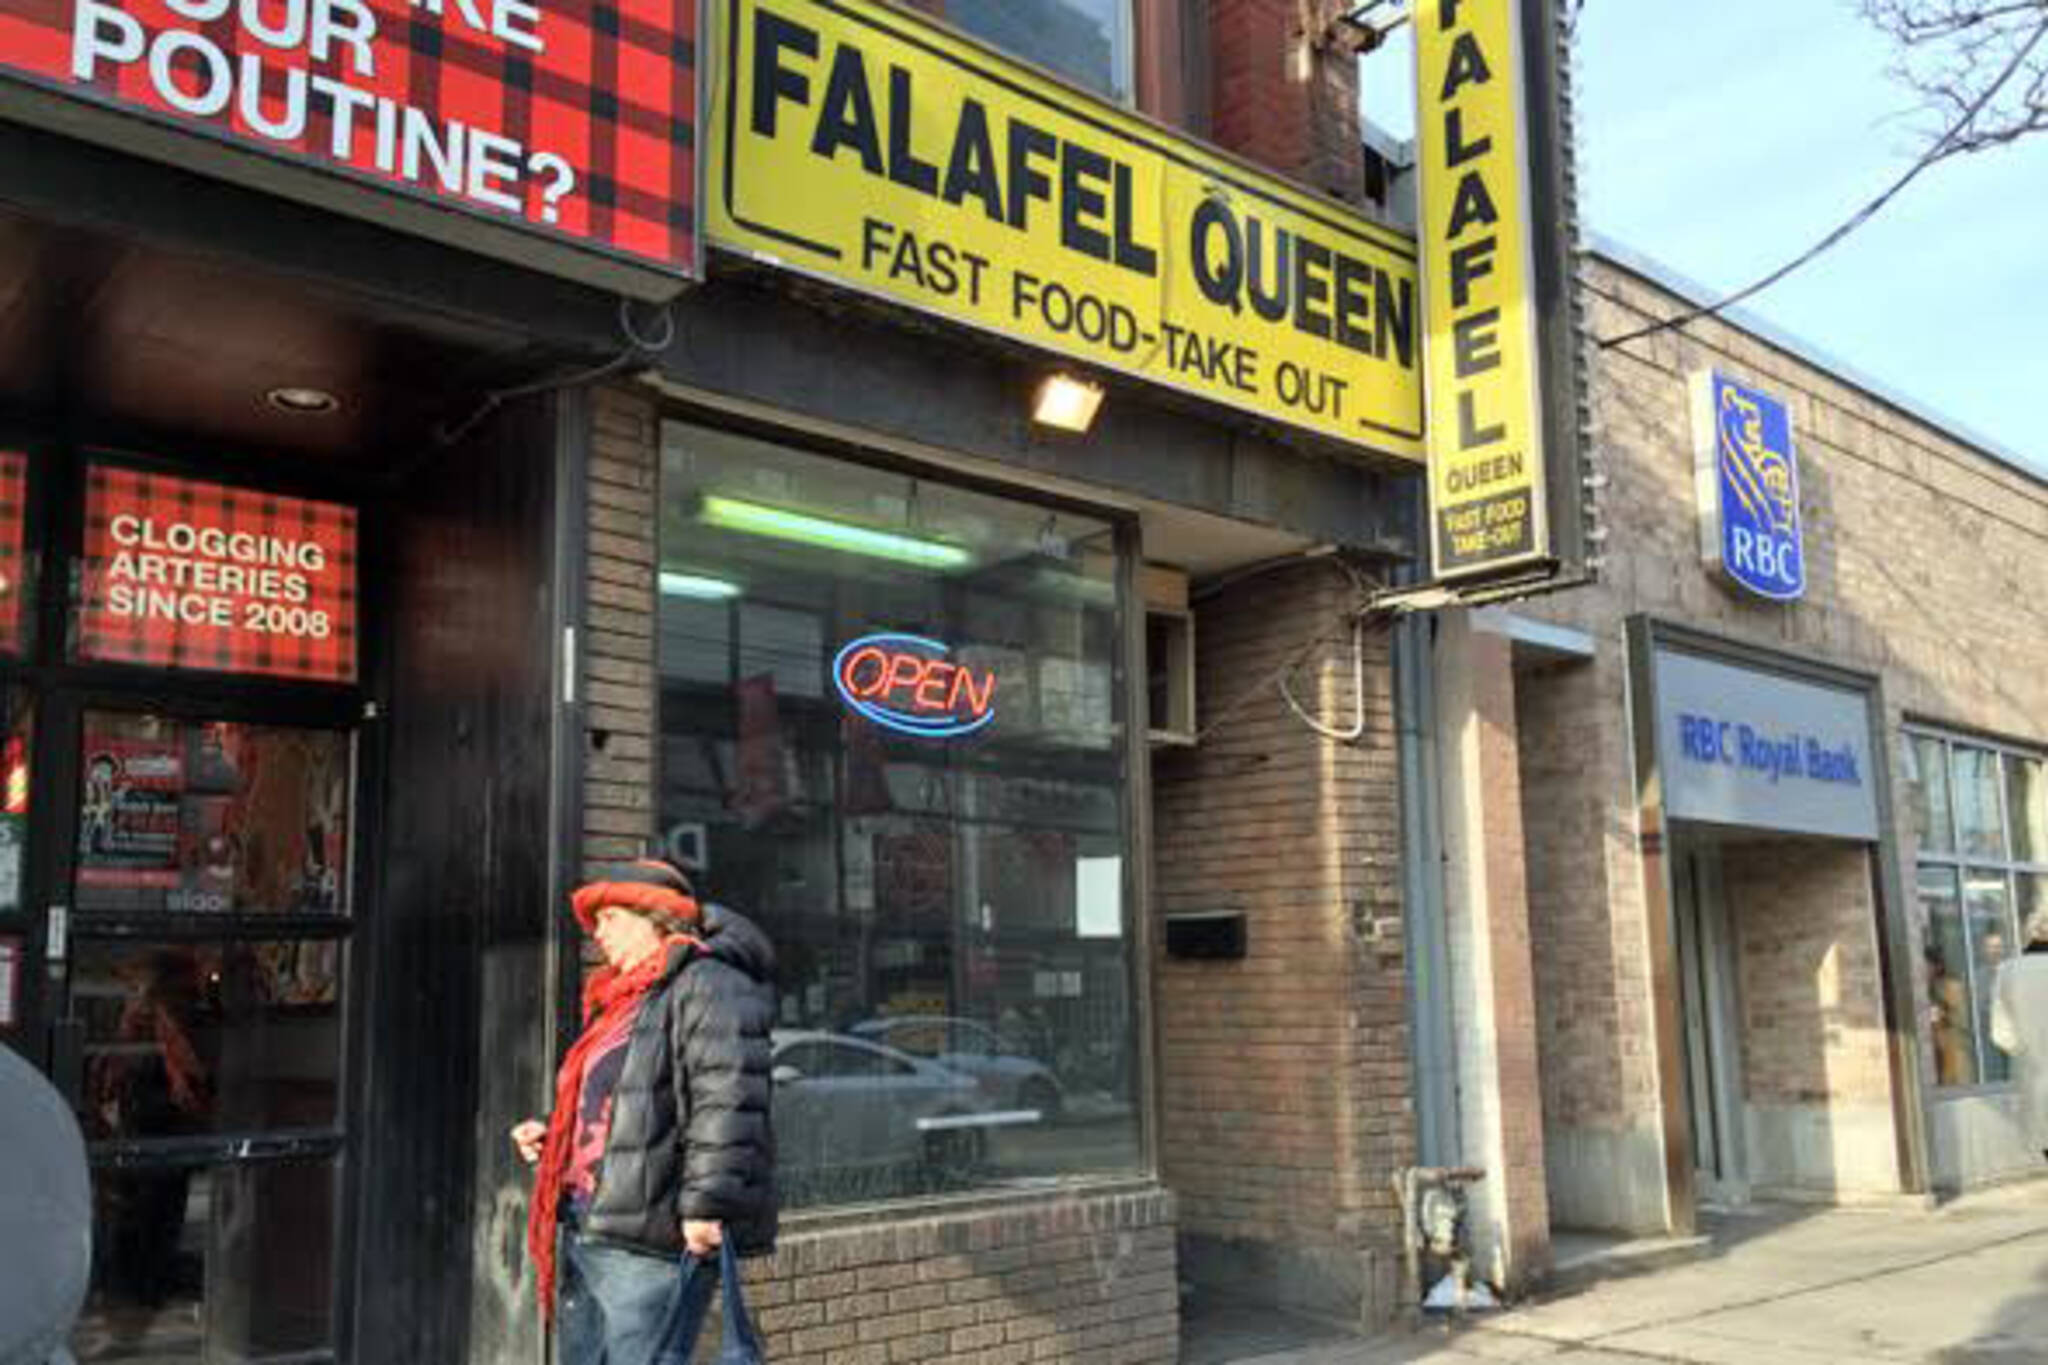 Falafel Queen Toronto